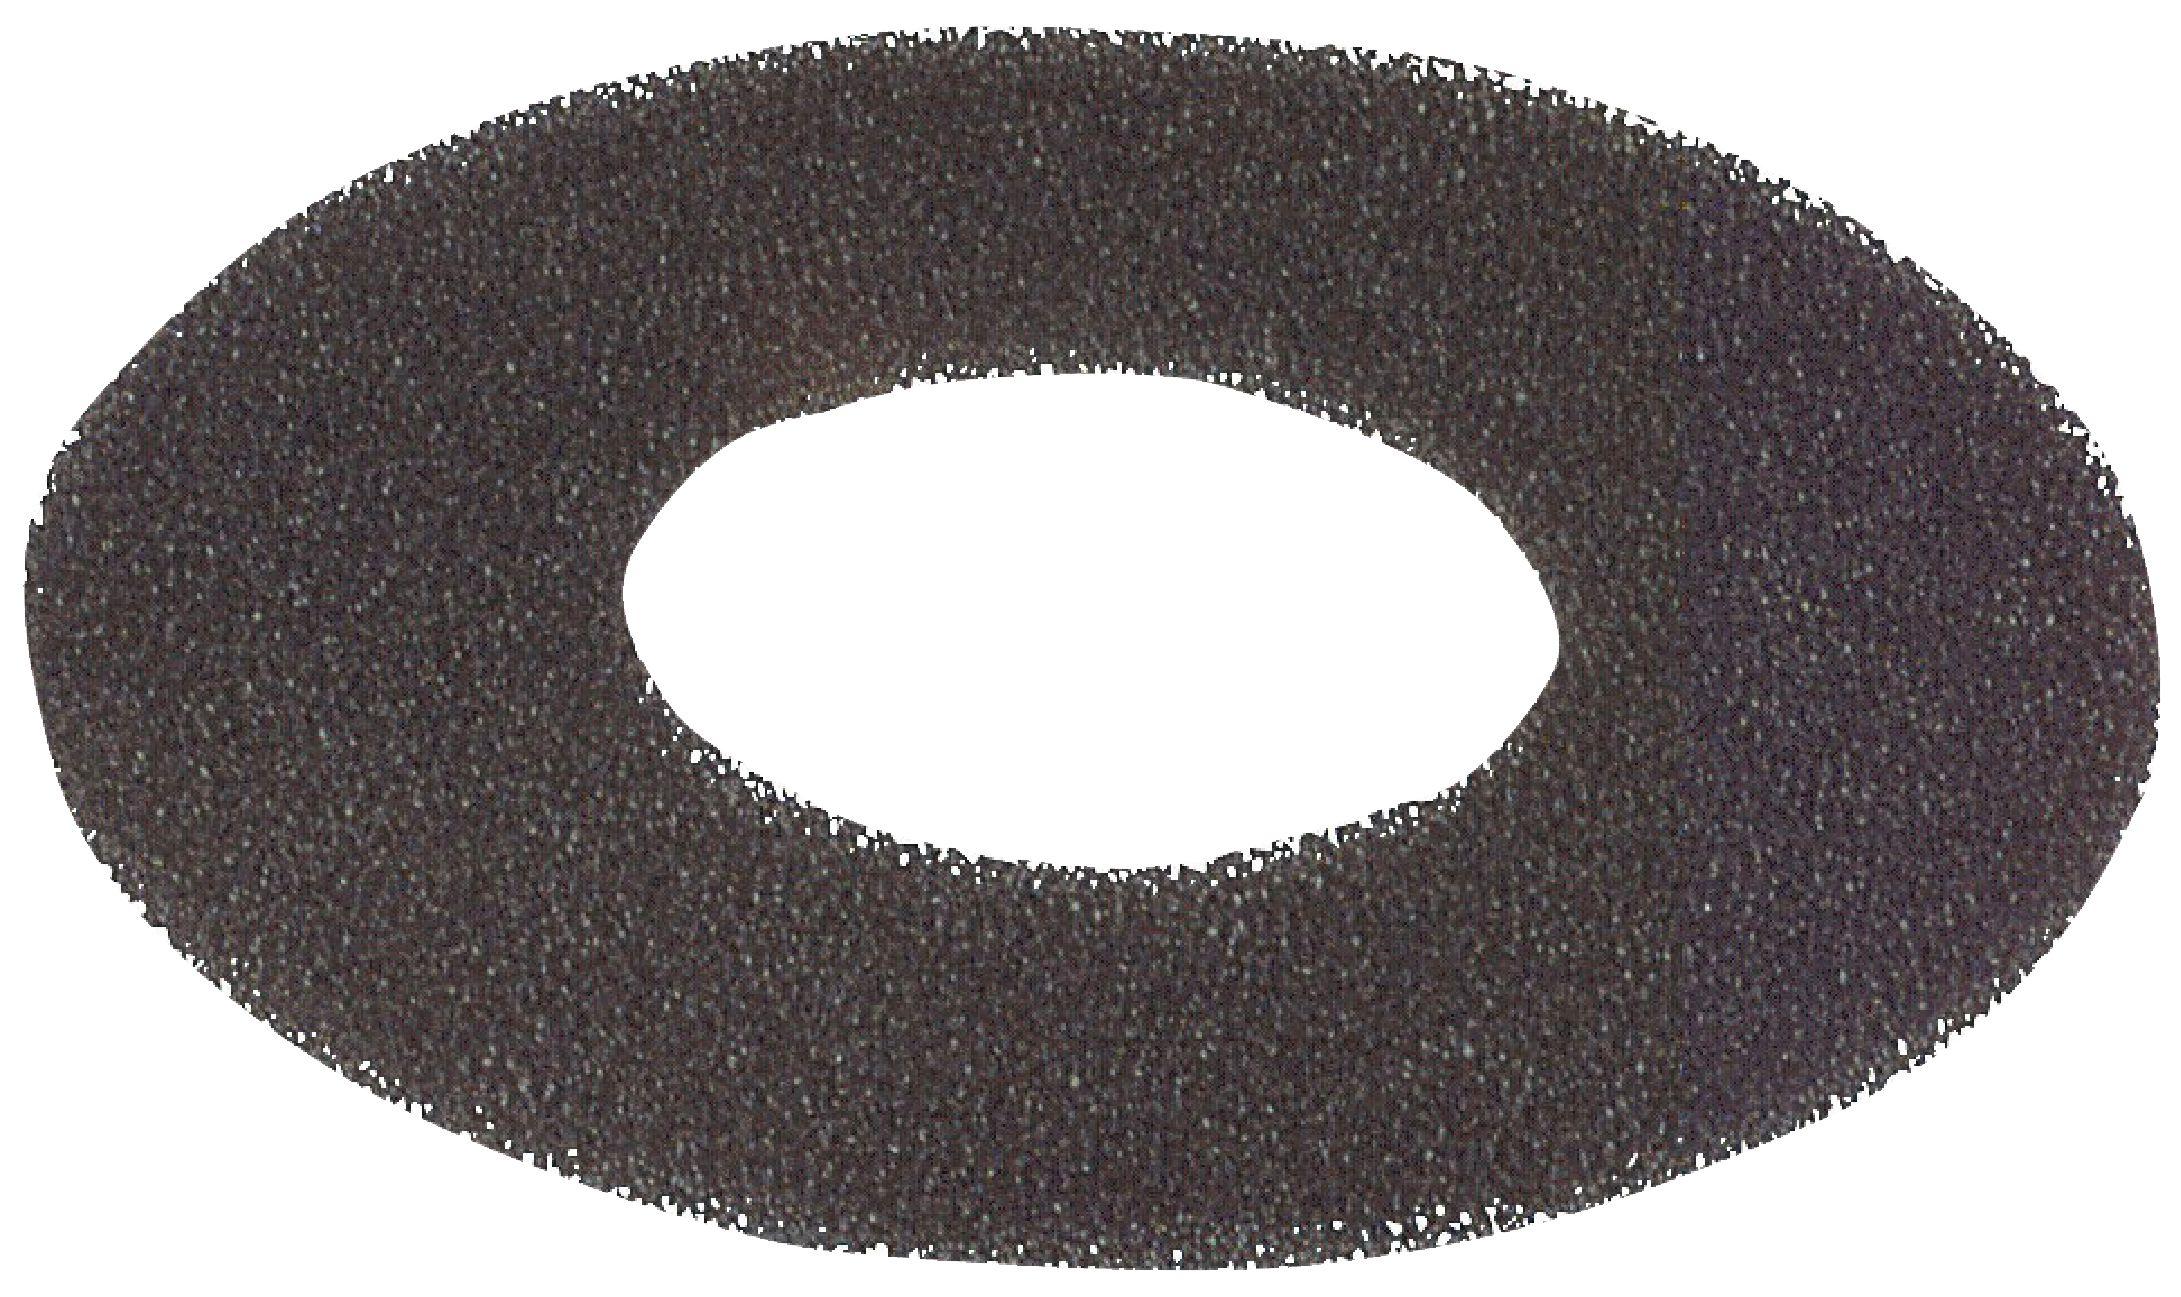 Tukový filtr do digestoře, Ø 25 cm HQ W4-49959/BLK